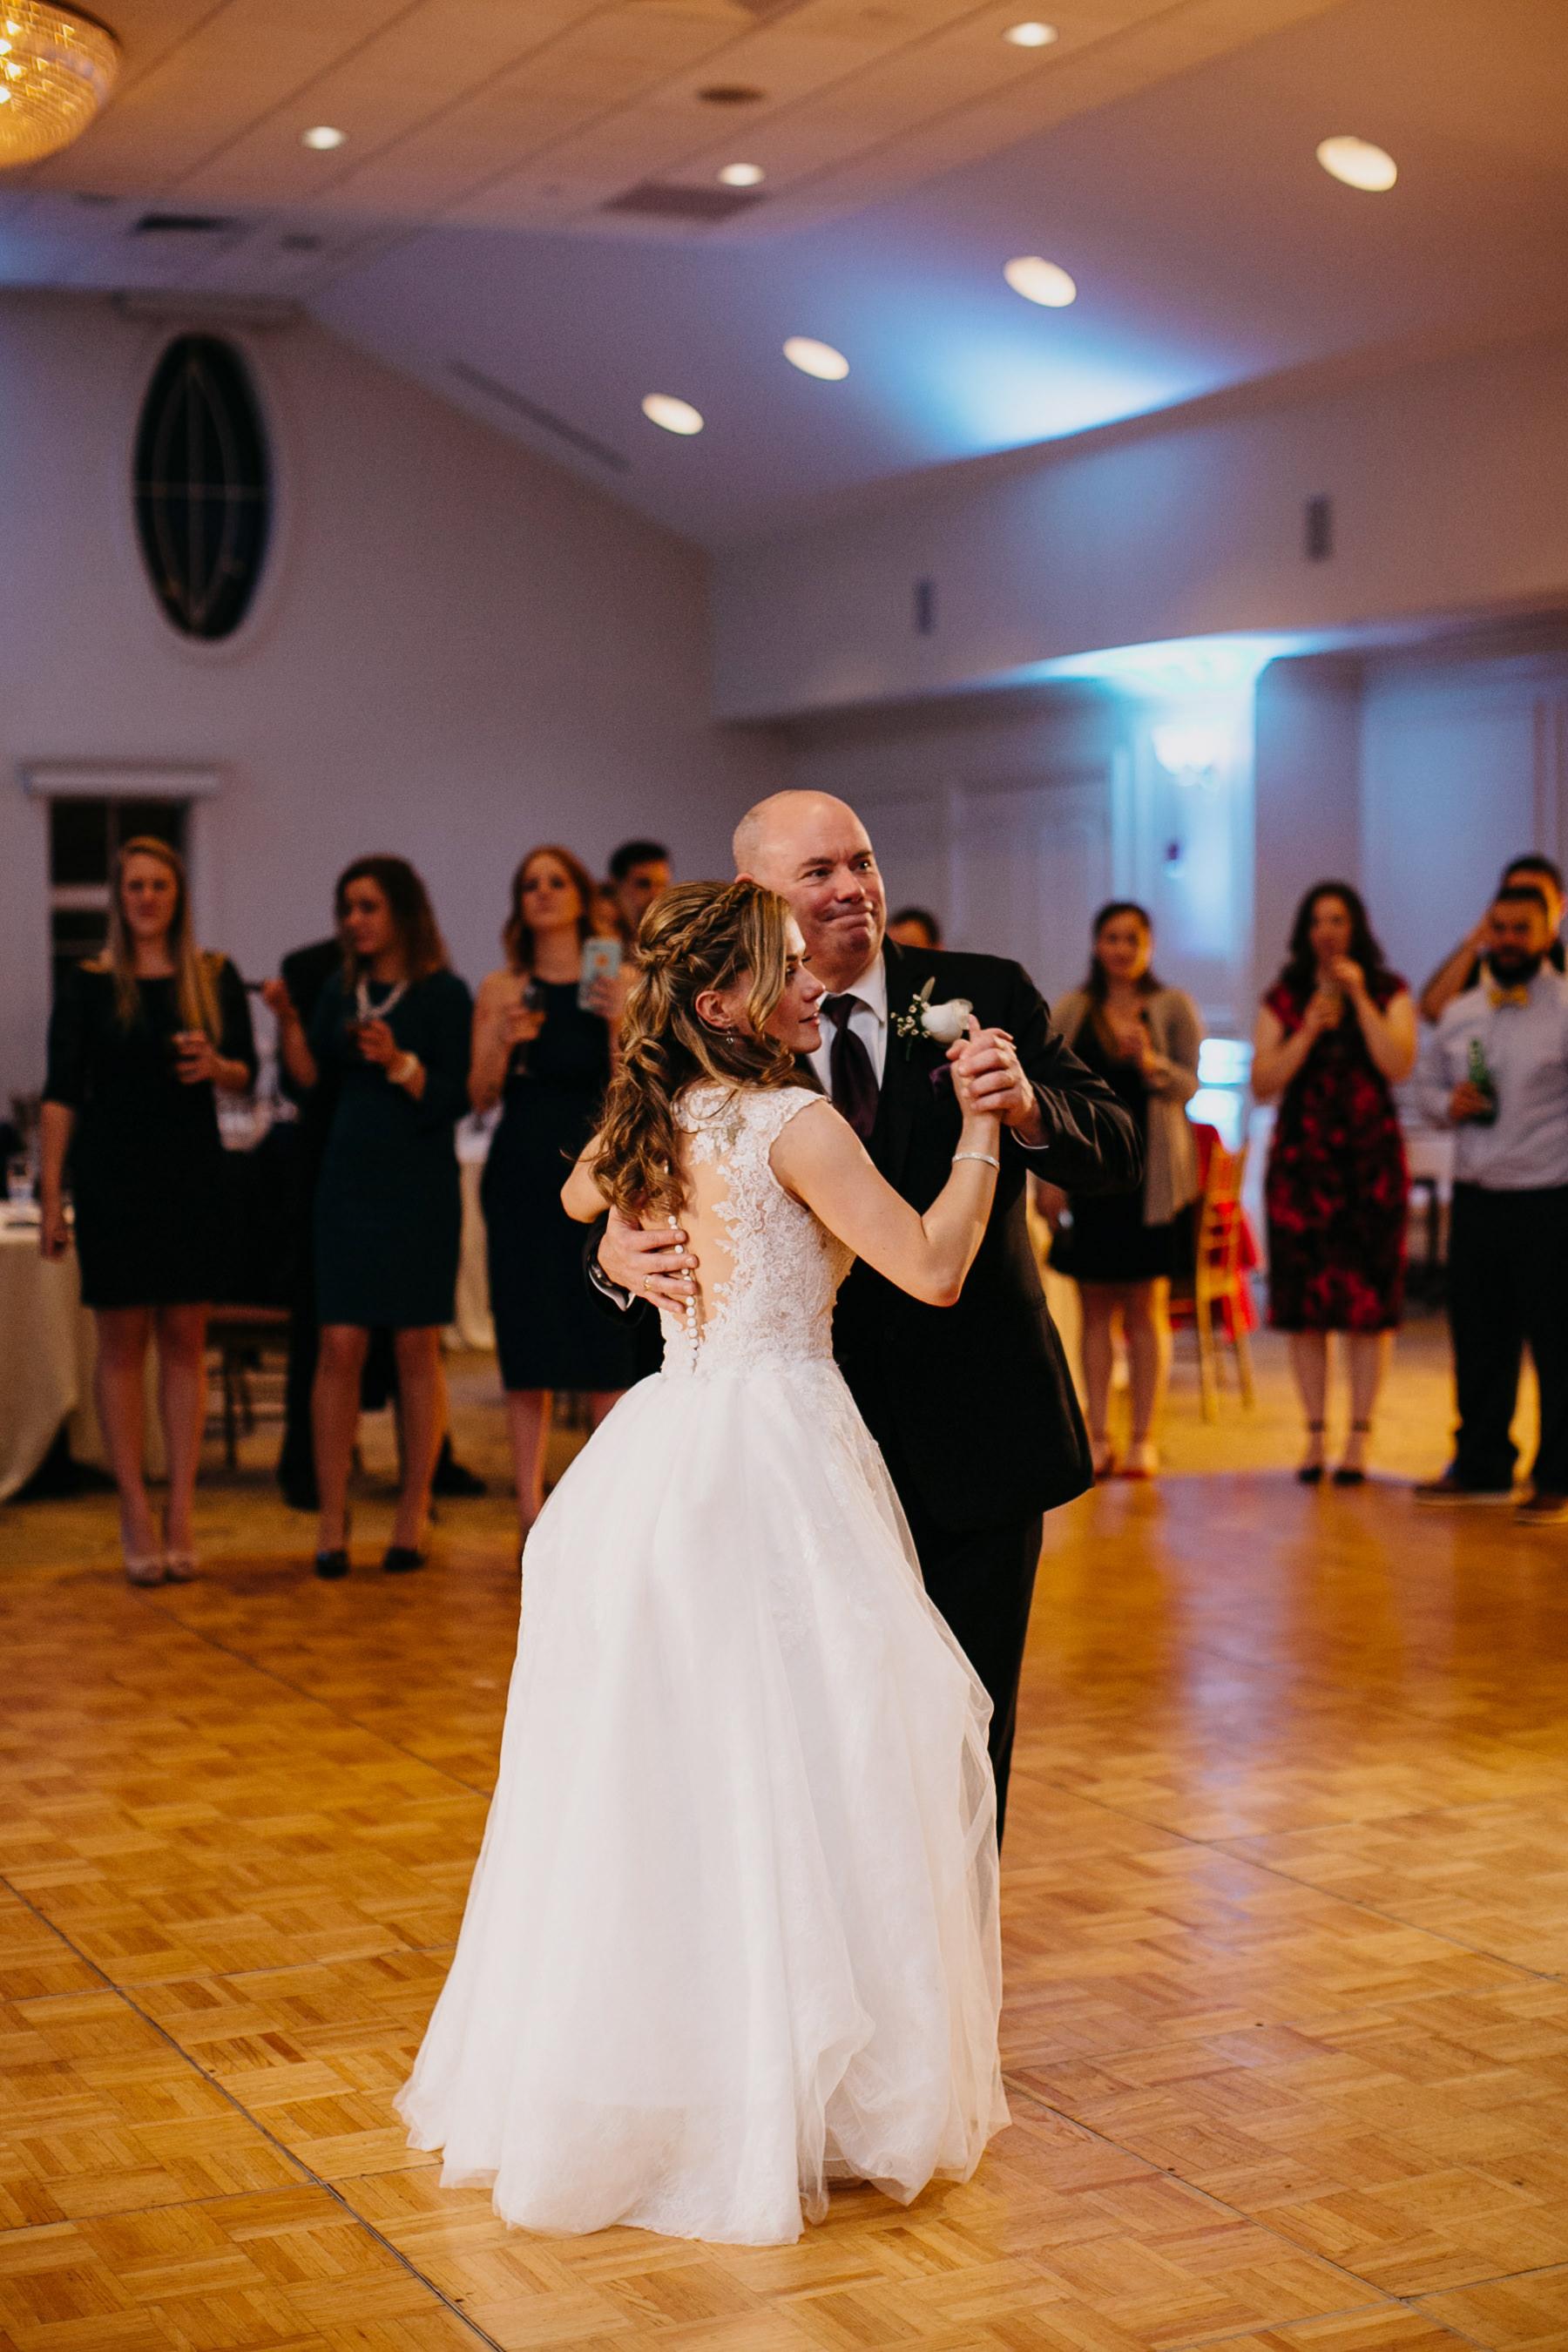 Quincy Ma Massachusetts Wedding Dedham Boston Granie Links Wedding New England Catholic Cathedral Liz Osban Photography 112.jpg